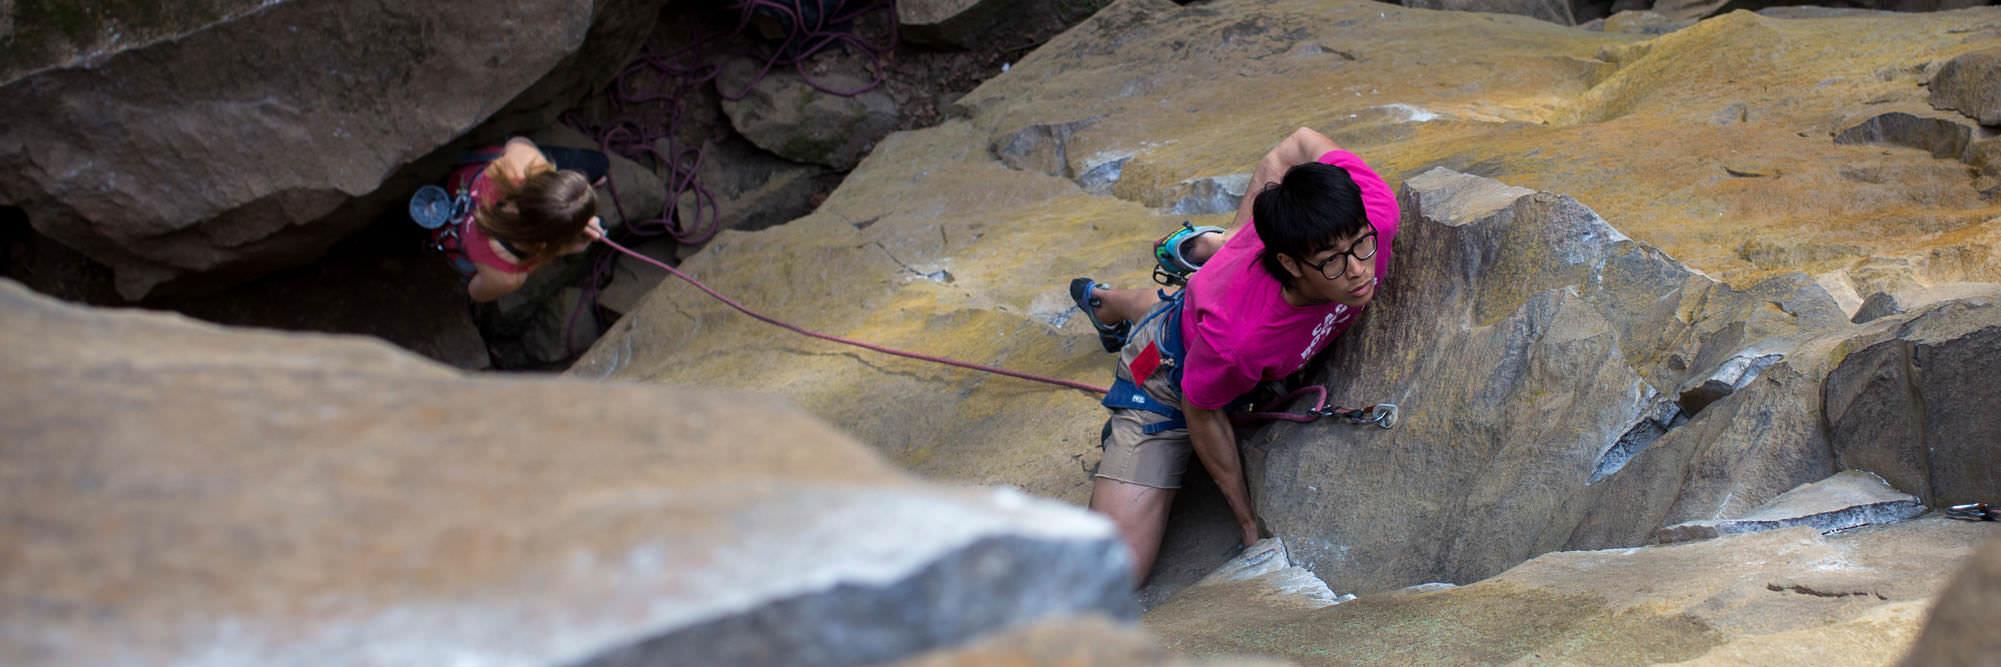 Top Climbing And Bouldering Adventures Travel Oregon